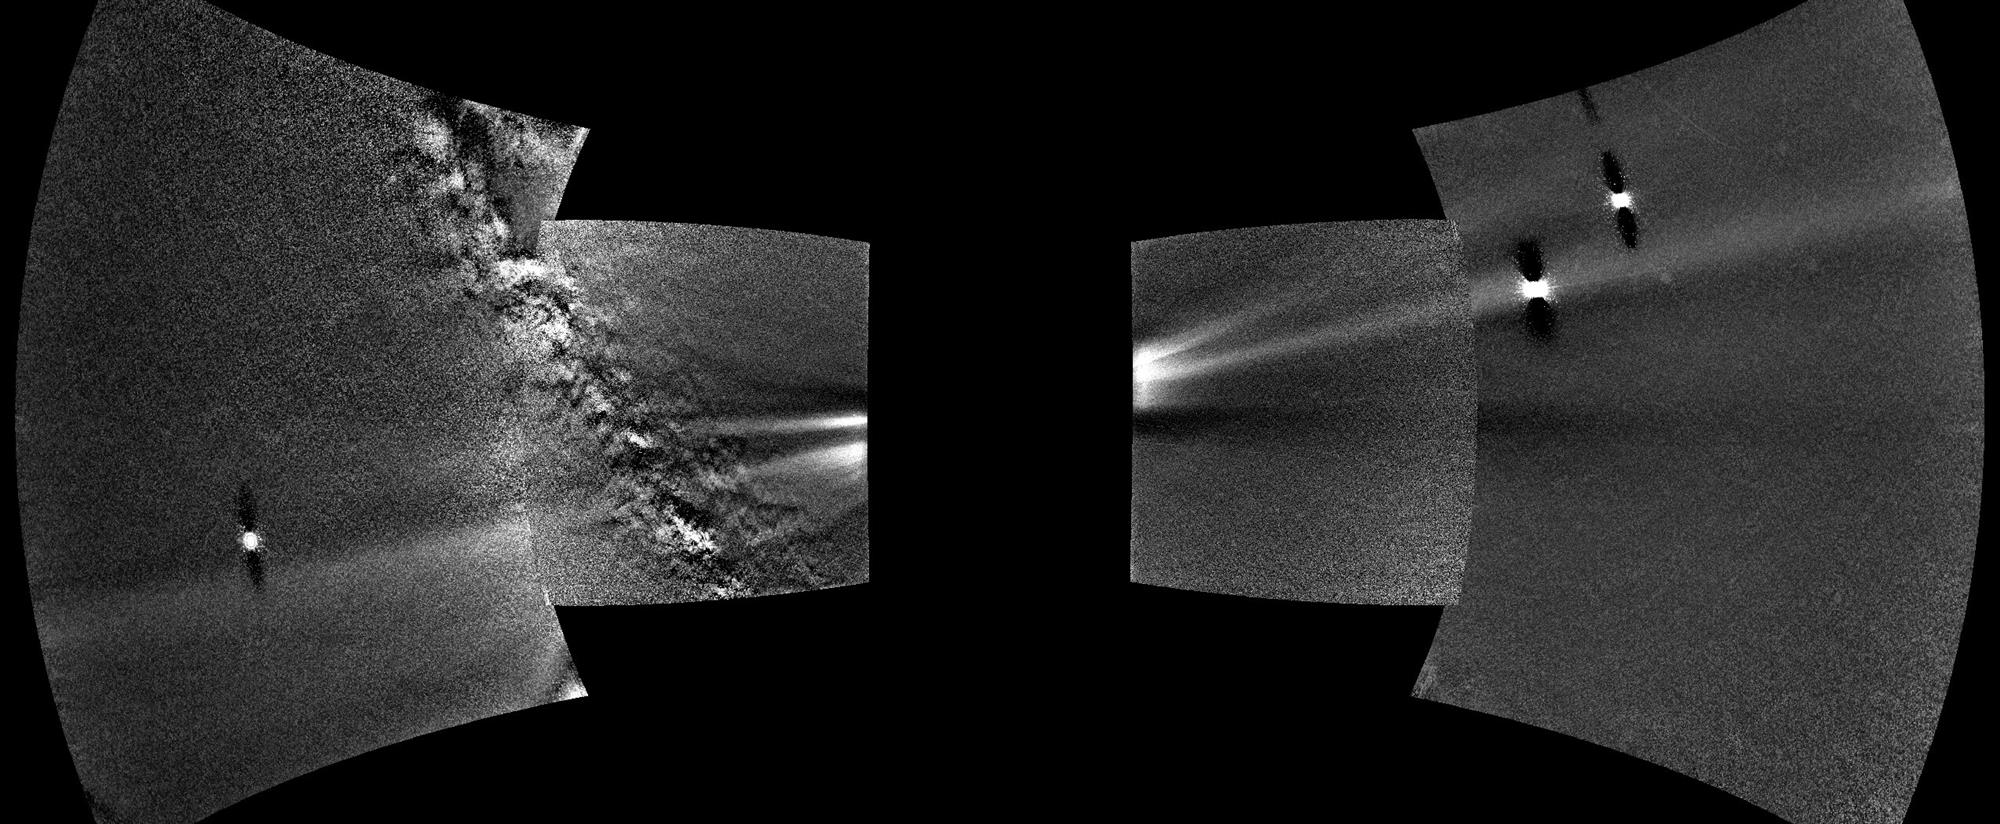 Credits: NASA/Johns Hopkins APL/Naval Research Laboratory/G. Stenborg and B. Gallagher